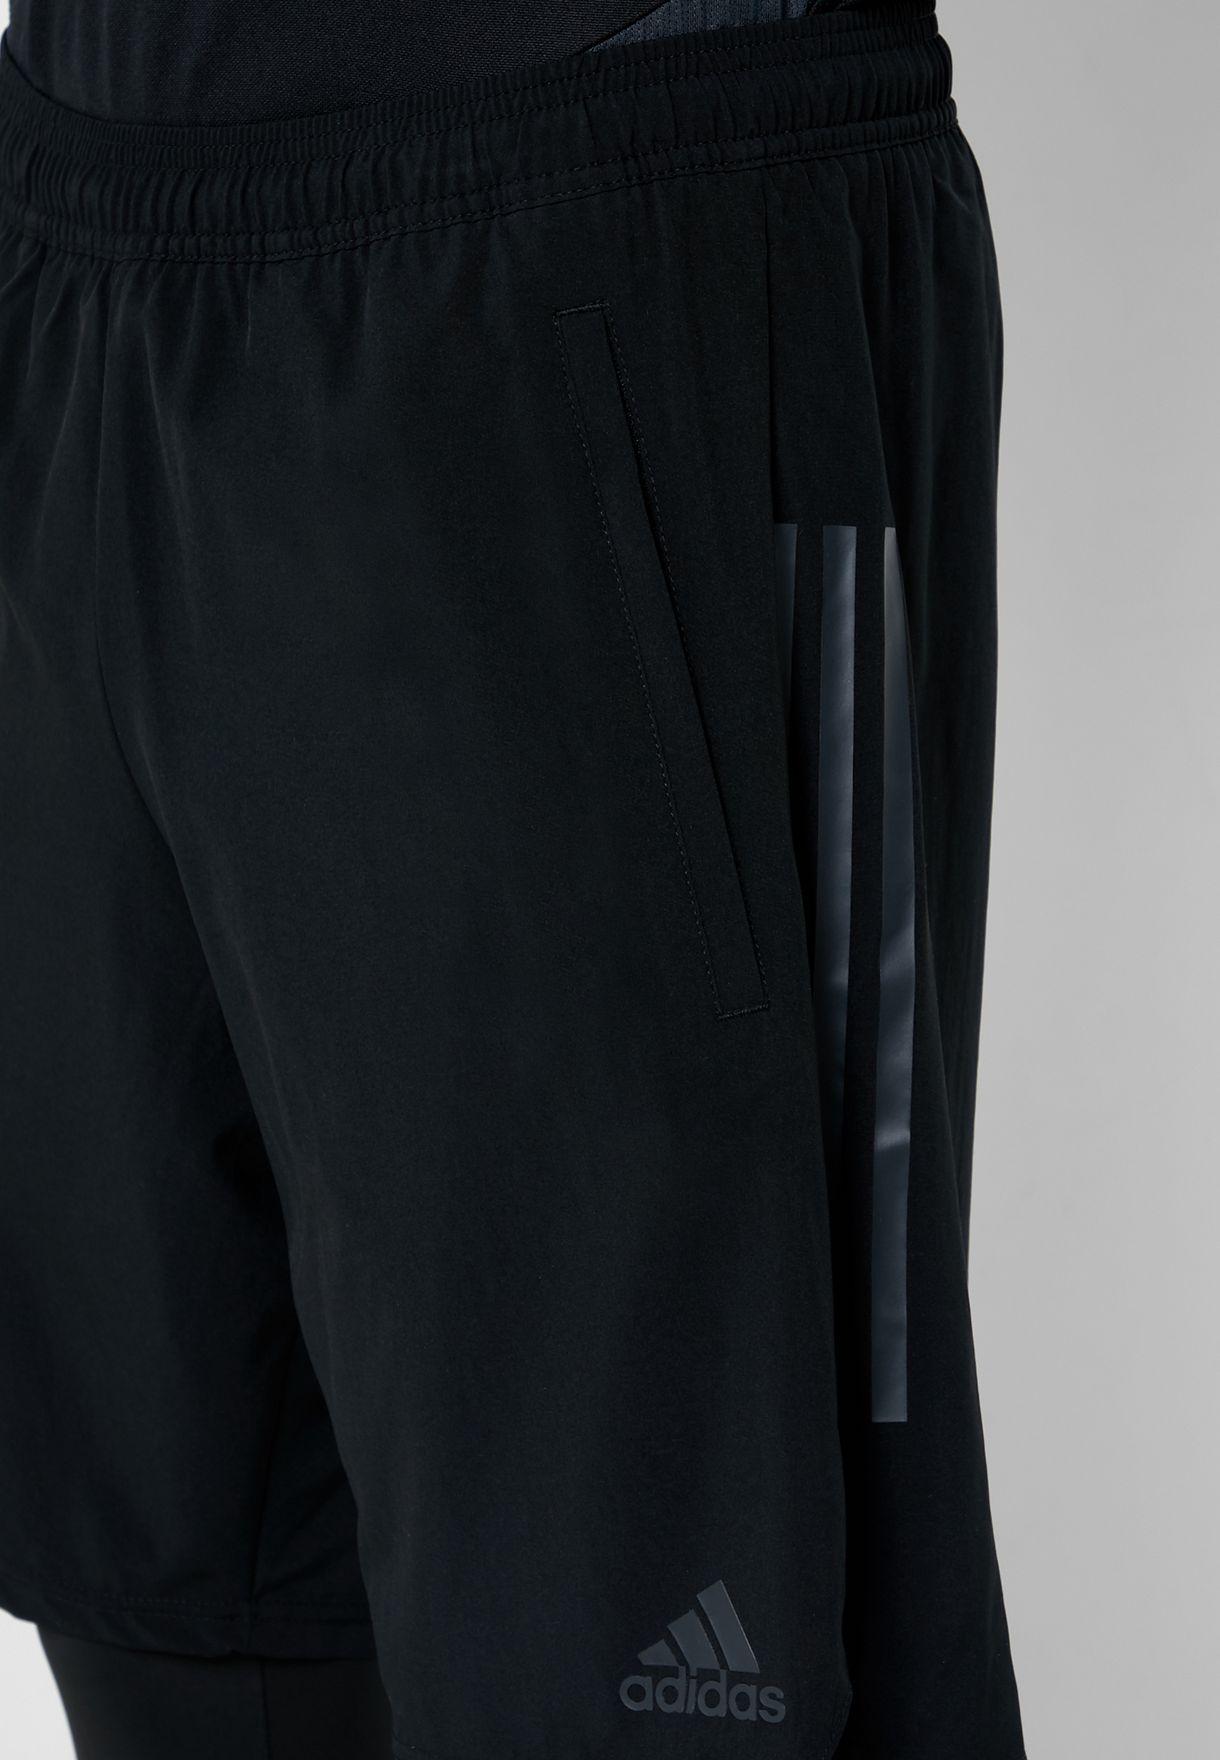 Tango 2In1 Shorts